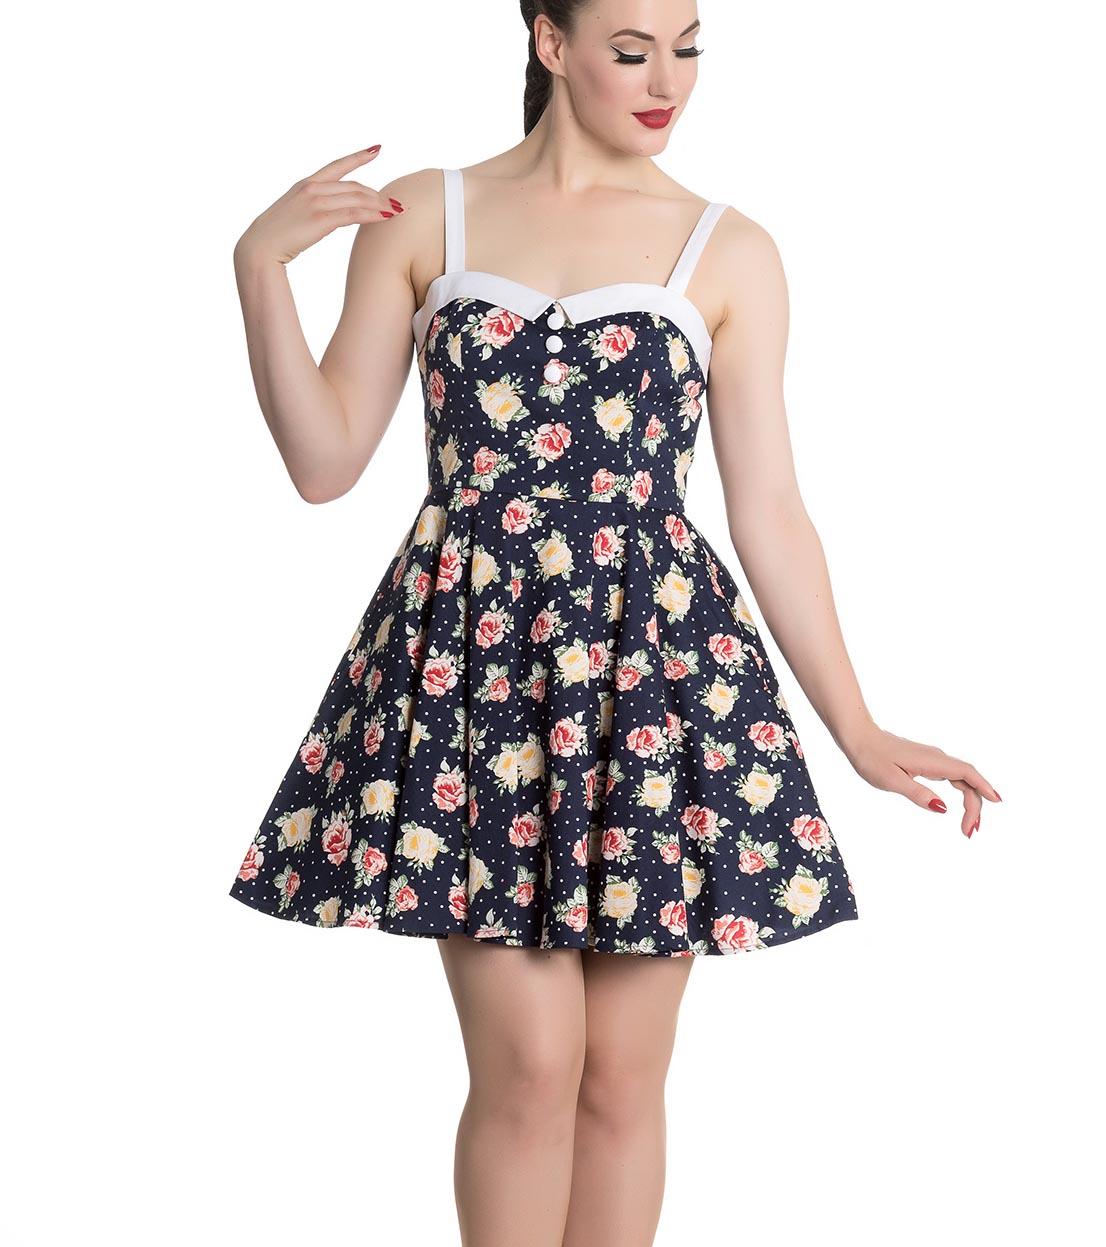 Hell-Bunny-Navy-Blue-Floral-Roses-Flowers-Mini-Dress-EMMA-Polka-Dot-All-Sizes thumbnail 23